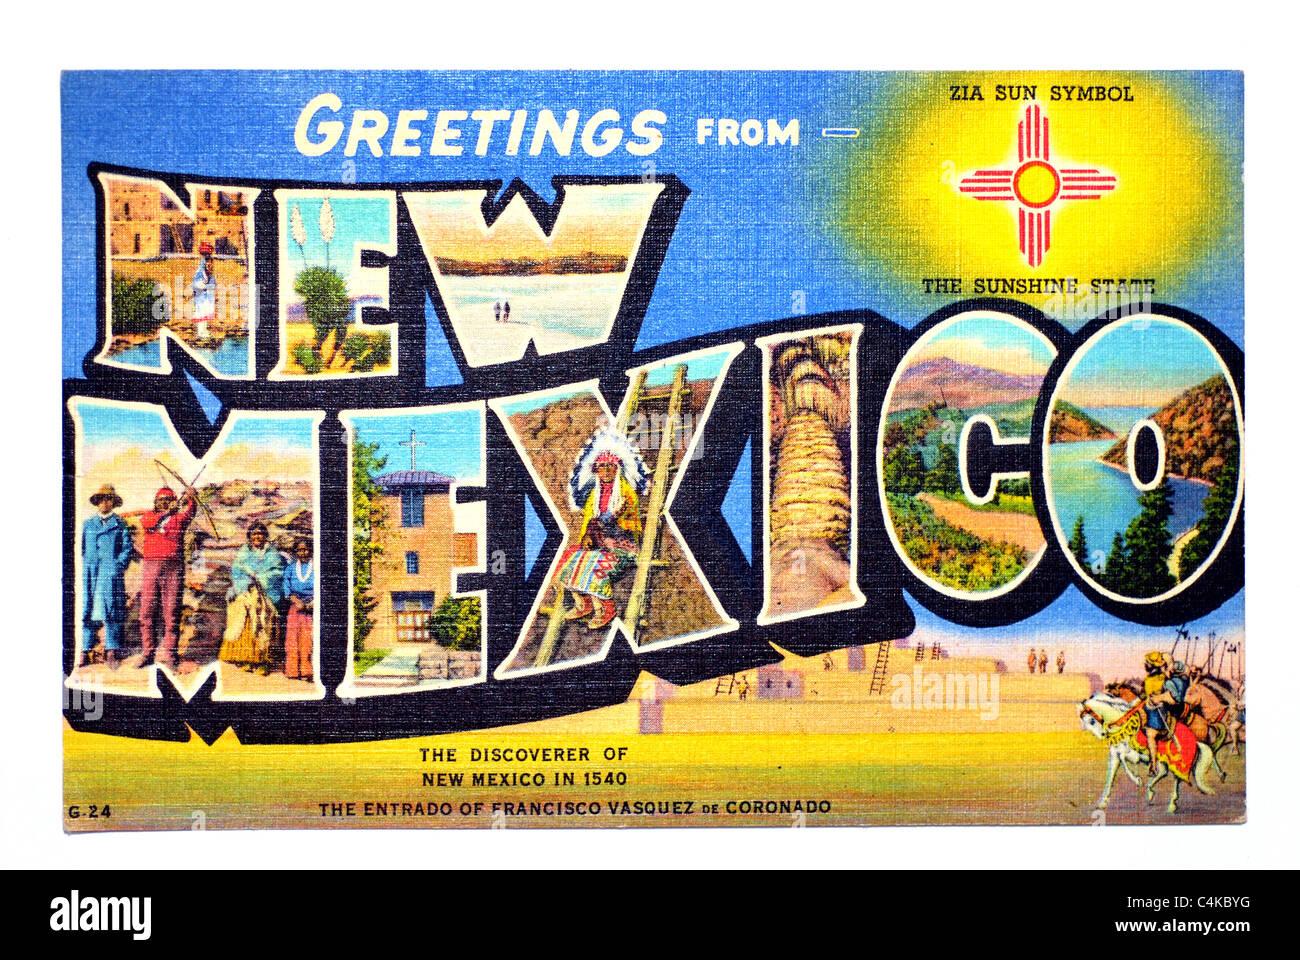 Greetings from america postcard stock photos greetings from greetings from new mexico vintage post card stock image kristyandbryce Choice Image